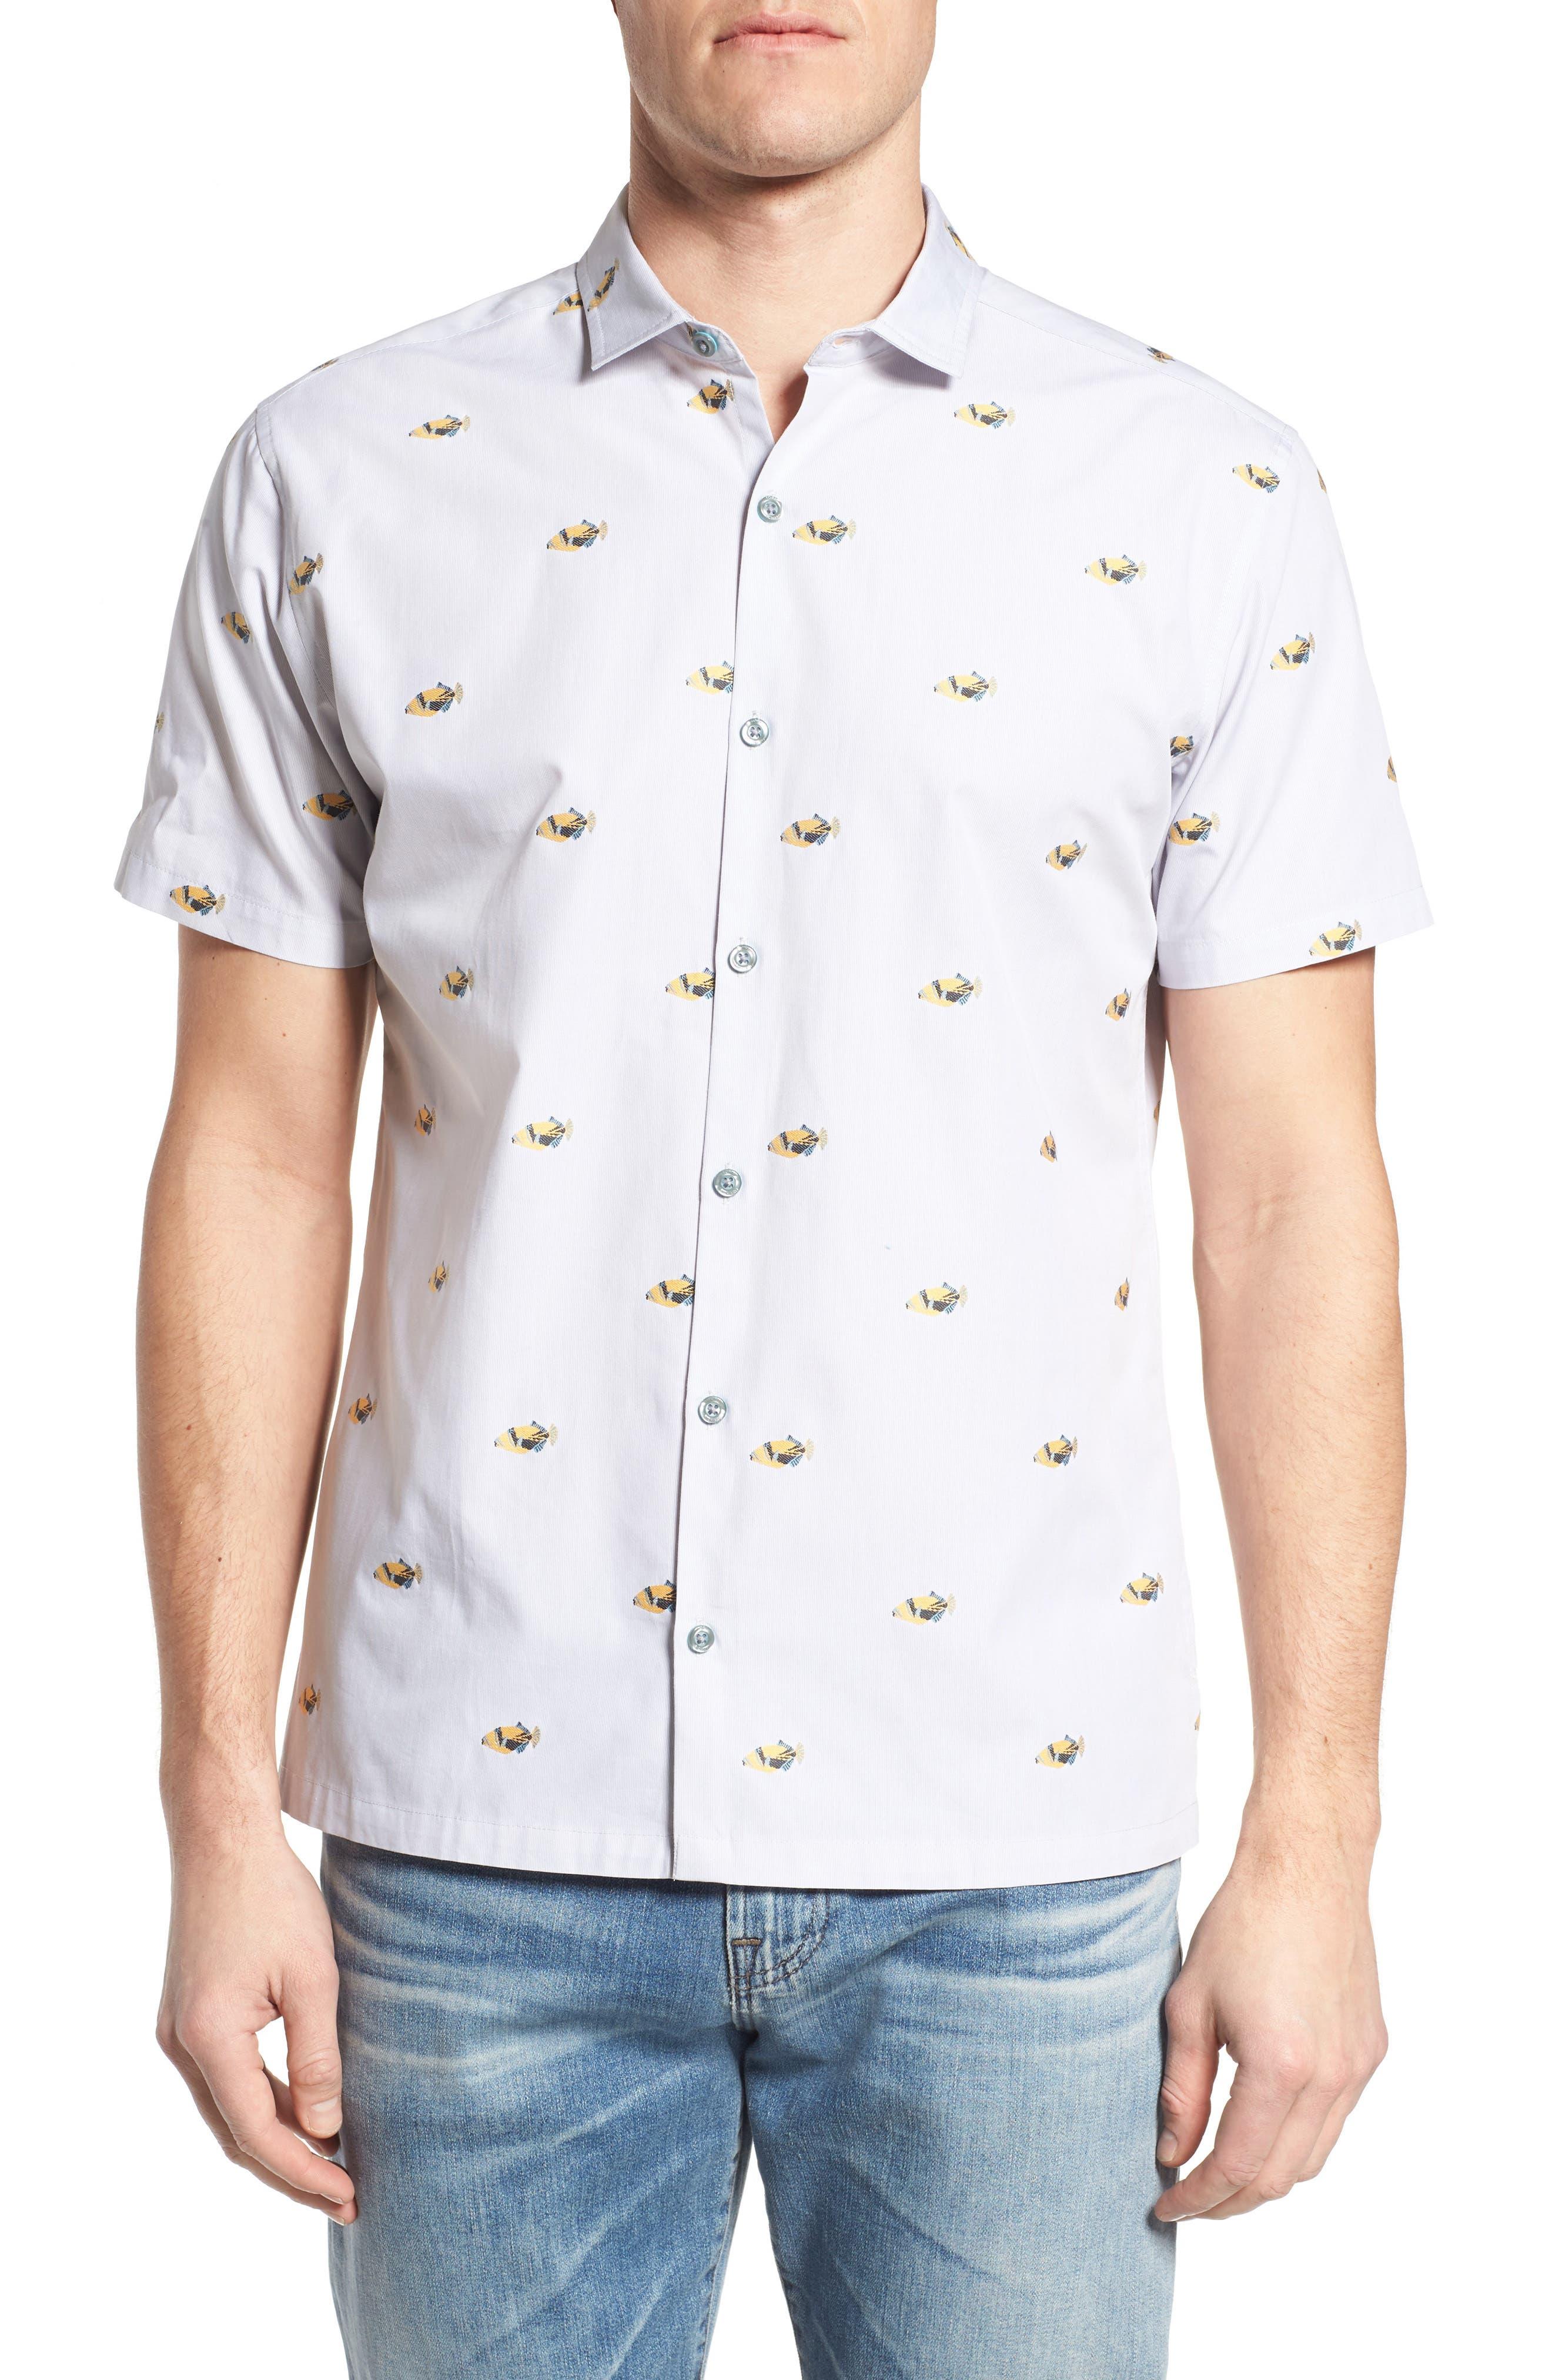 Alternate Image 1 Selected - Tori Richard 1Humu 2Humu Embroidered Sport Shirt